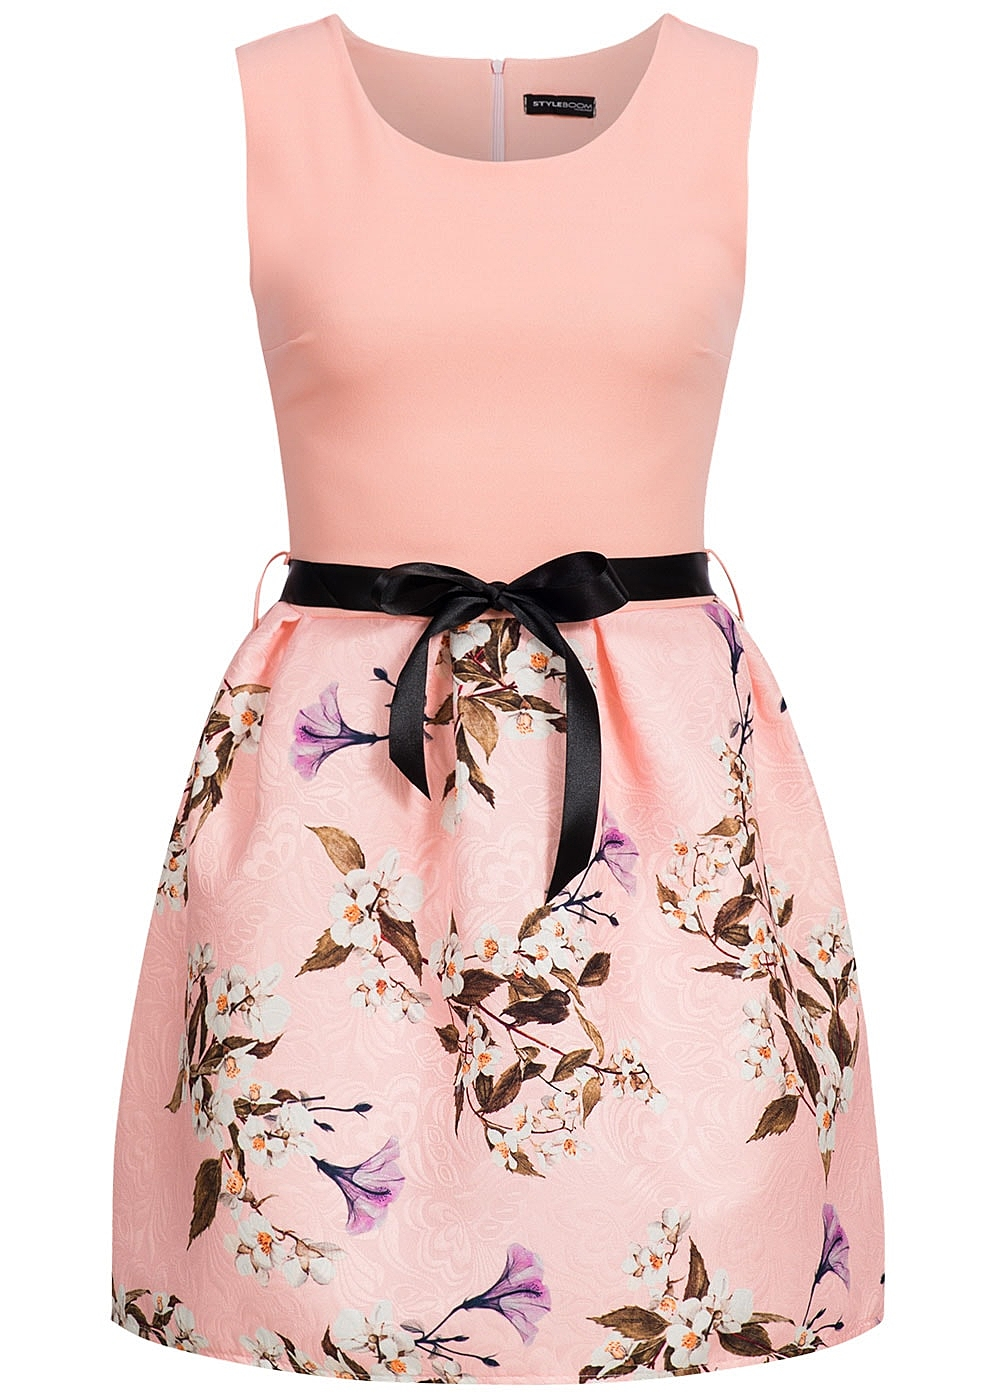 styleboom fashion damen mini kleid blumen muster bindeband zipper hinten rosa 77onlineshop. Black Bedroom Furniture Sets. Home Design Ideas